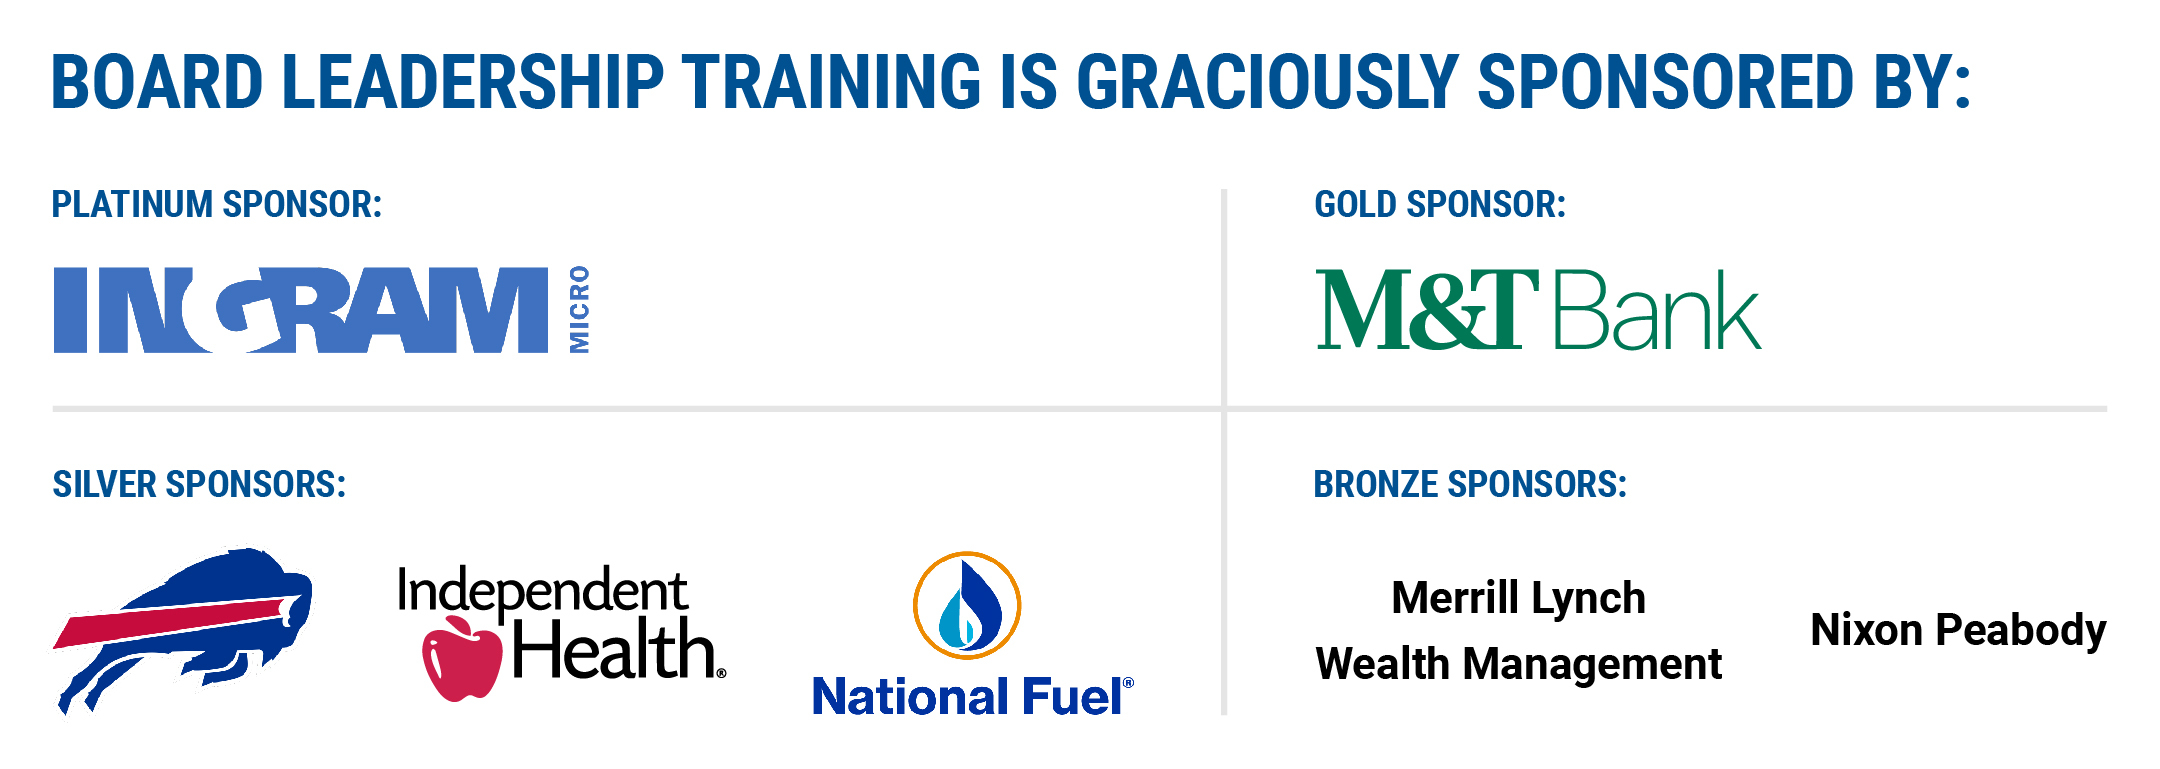 Board Leadership Training Sponsors